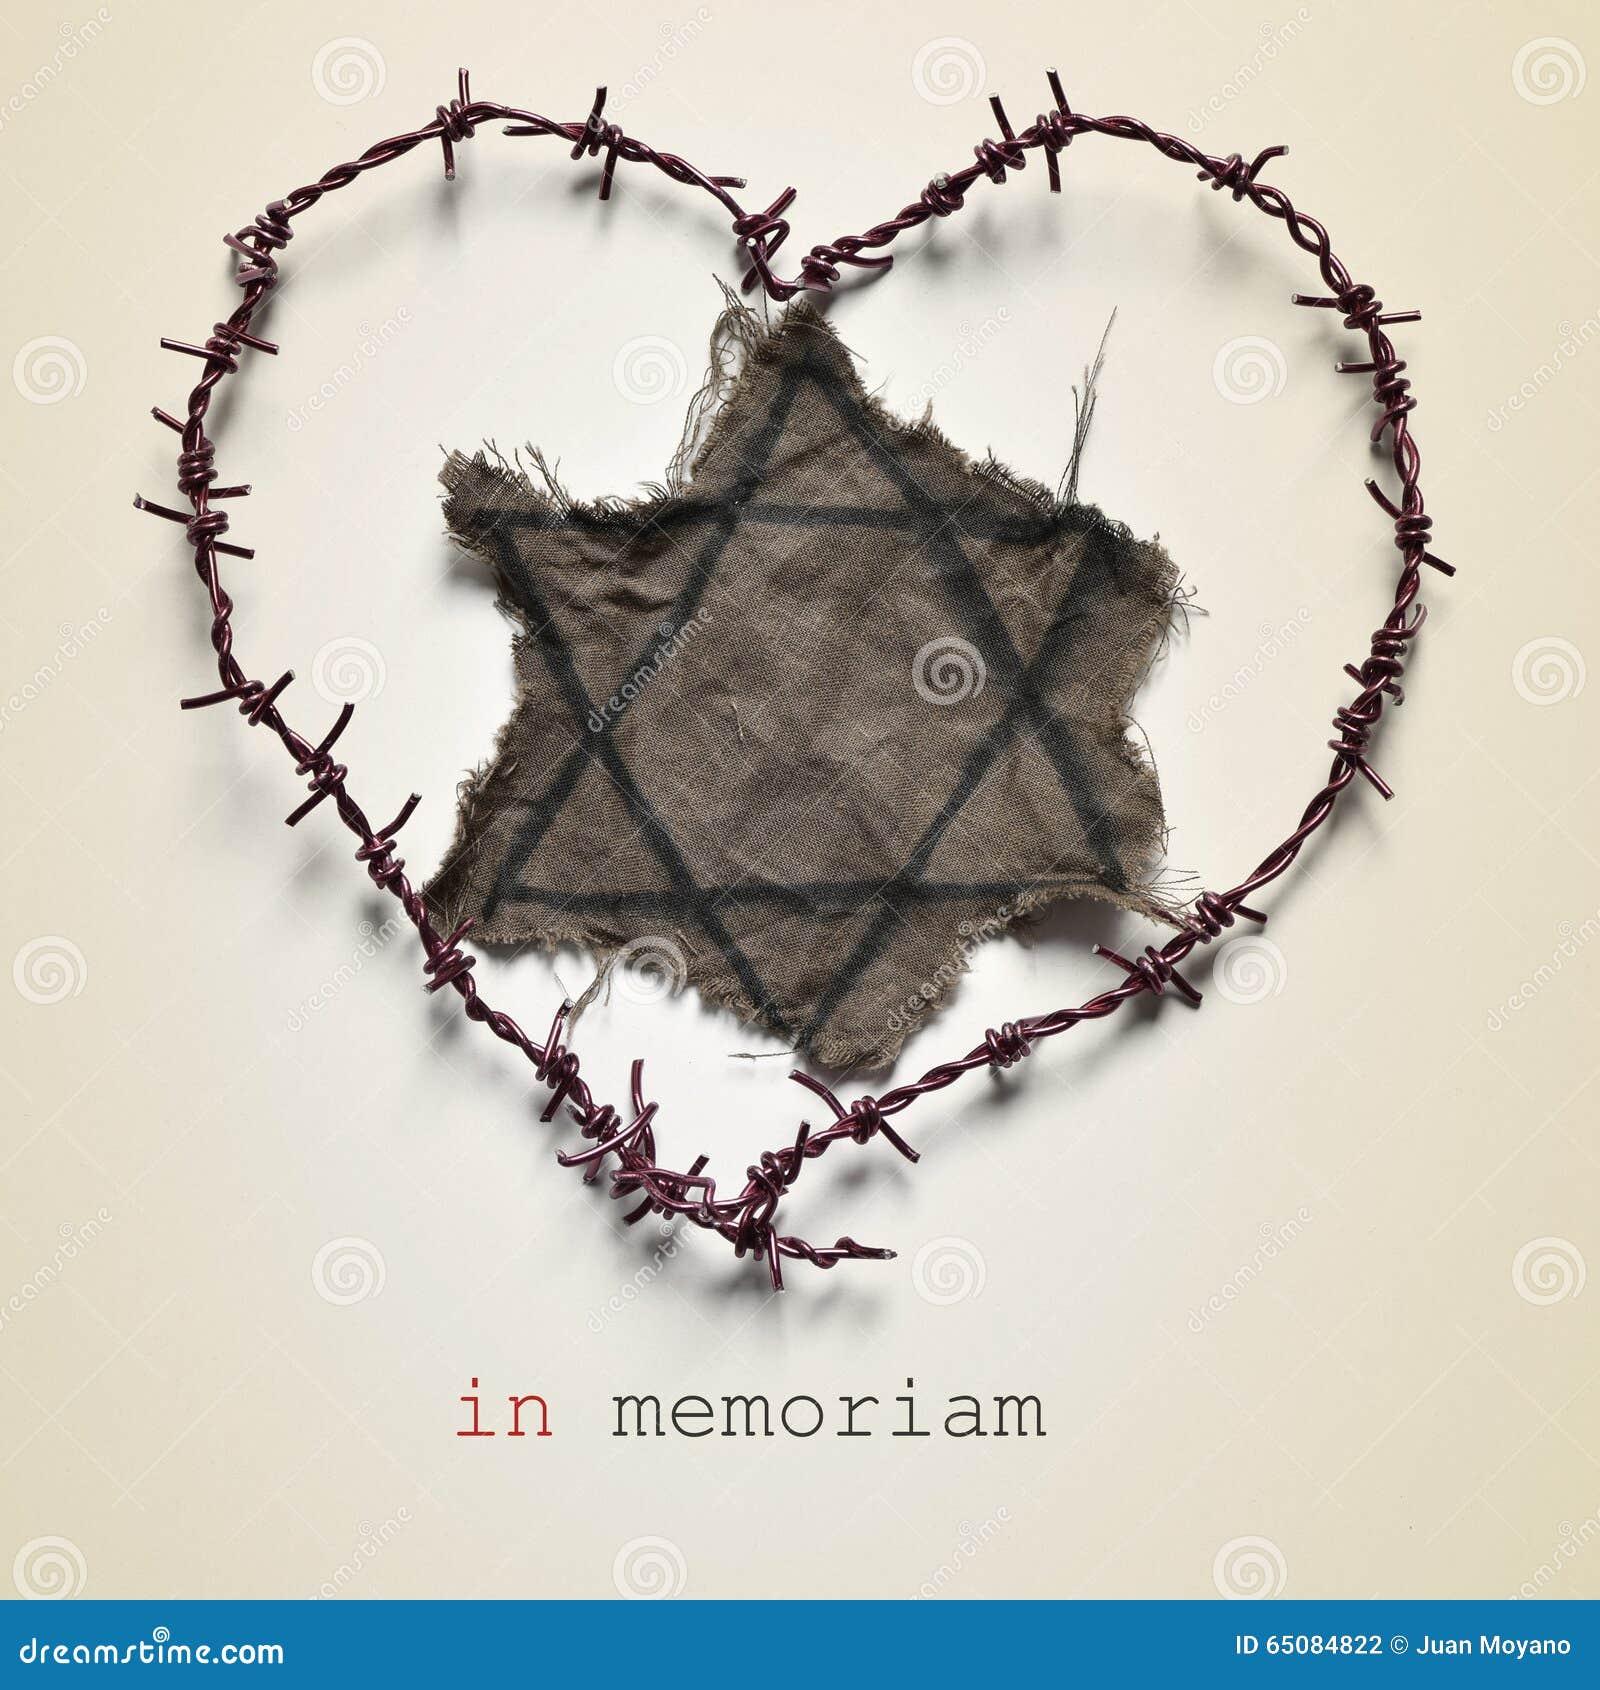 Jewish badge and text in memoriam